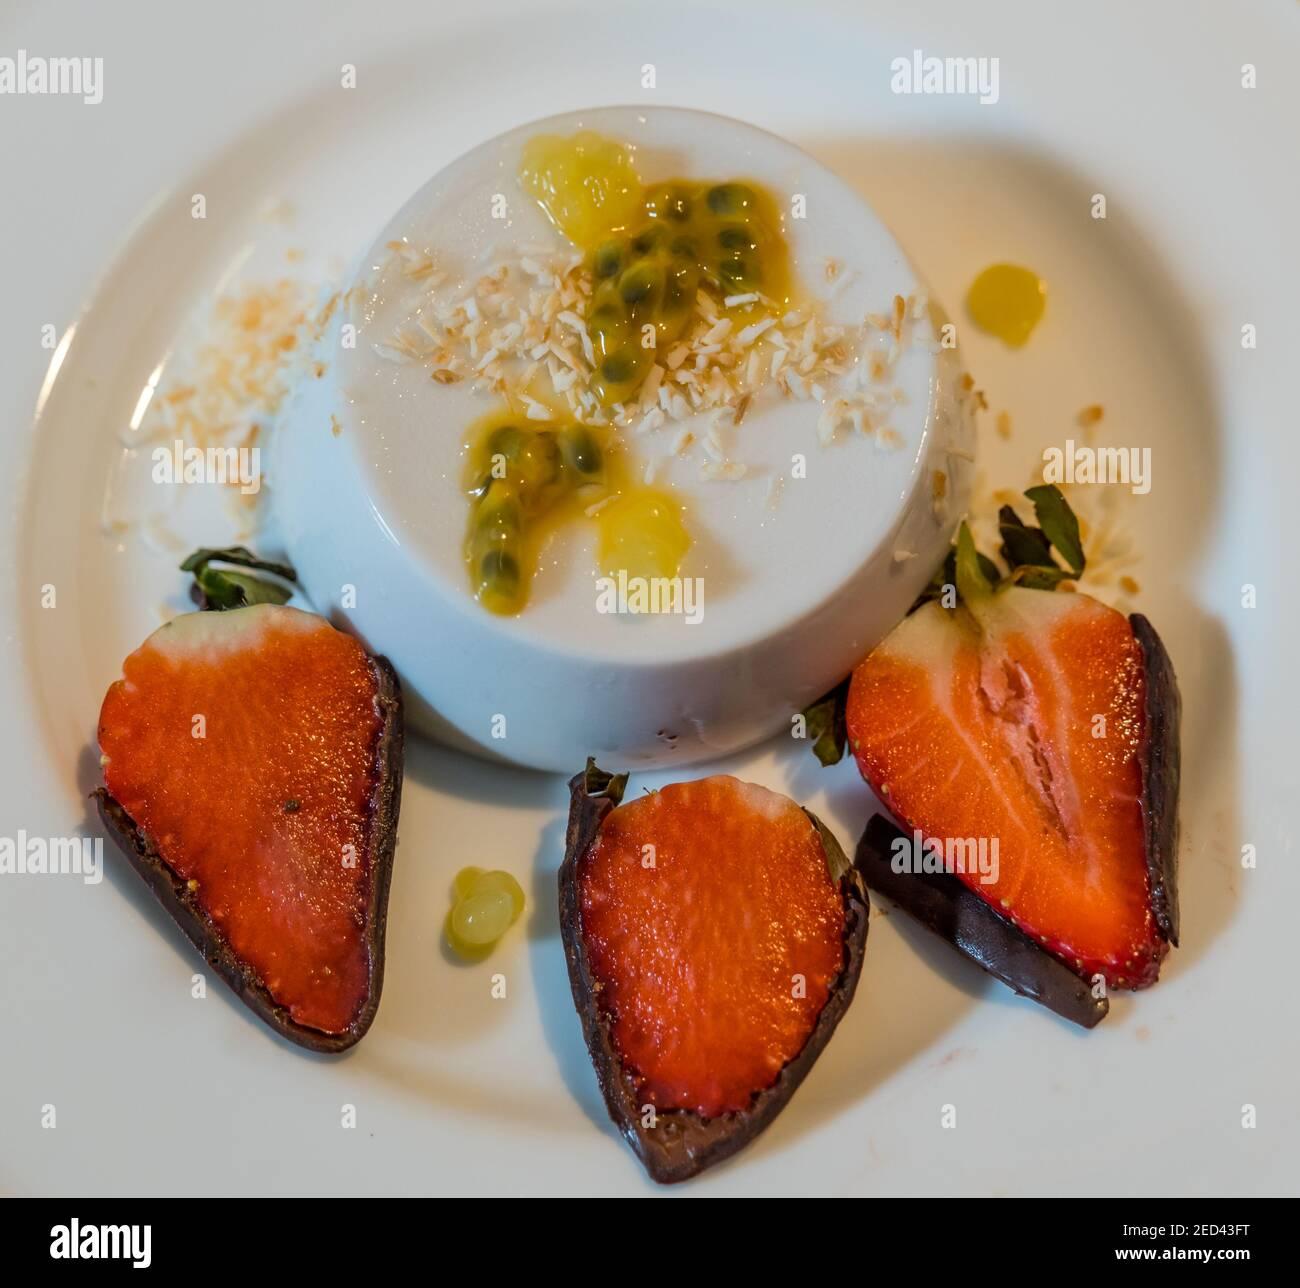 fine-dining-dessert-plate-coconut-panna-